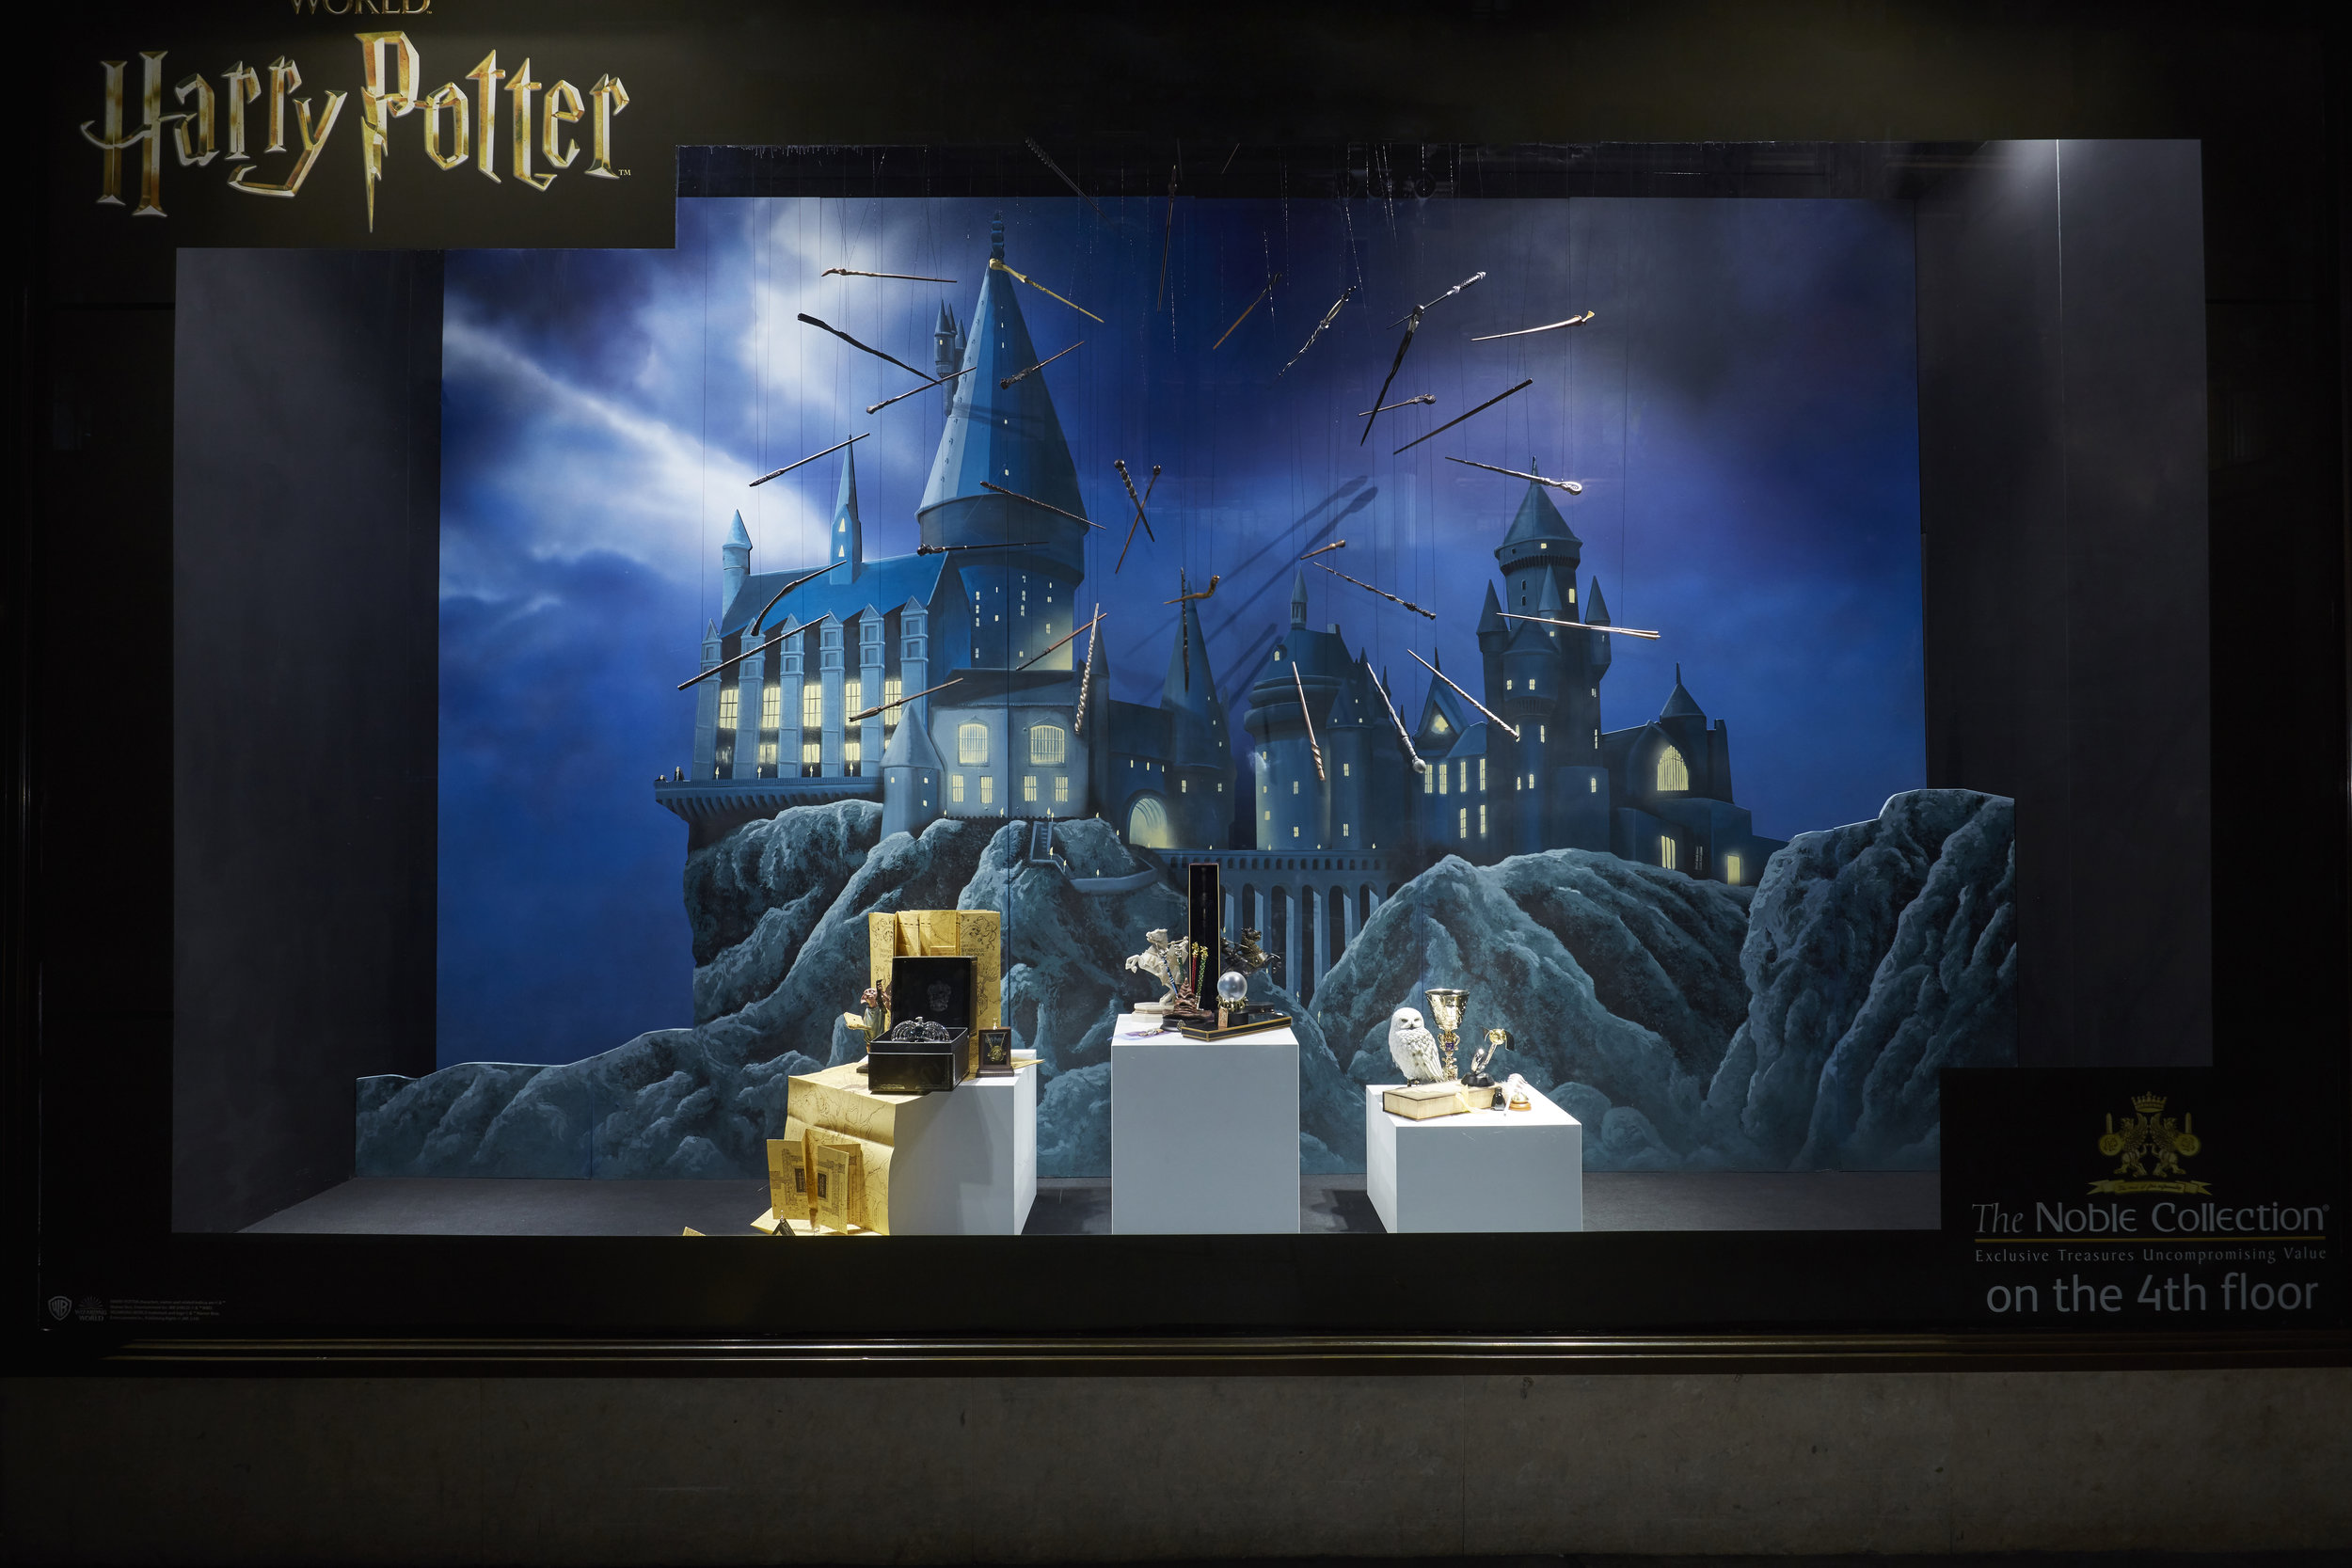 Propability, Harry Potter, Hogarts & Wands, Hamlyes .jpg